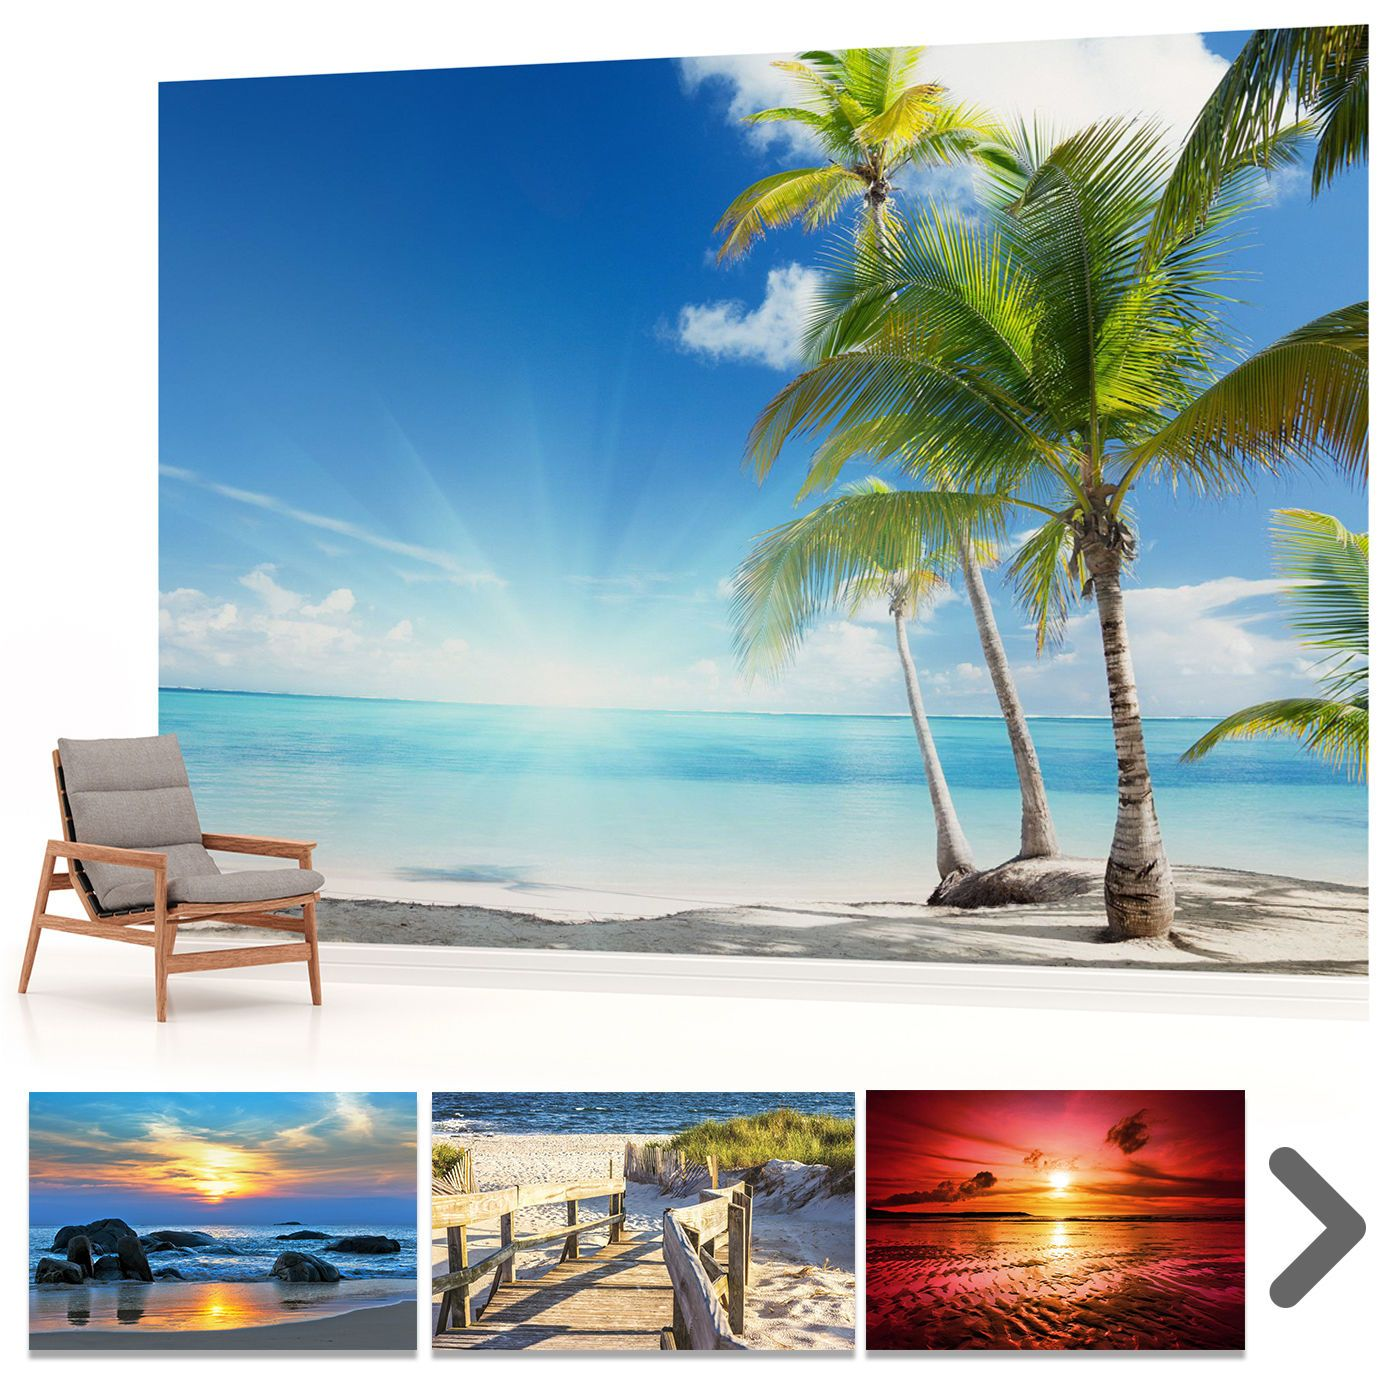 Fototapete Wandbild Fototapeten Bild Tapete Strand Meer Sonnenuntergang Vlies Ve Eur 29 90 Fototapete Tapeten Wandbild Wand